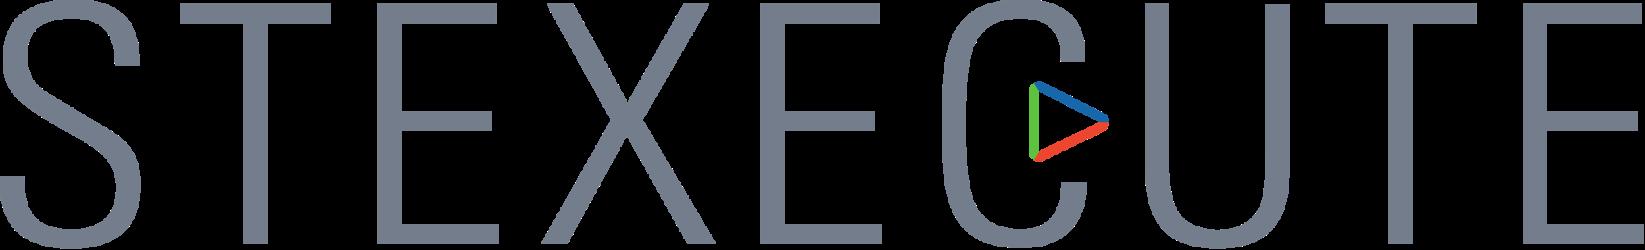 Stexecute